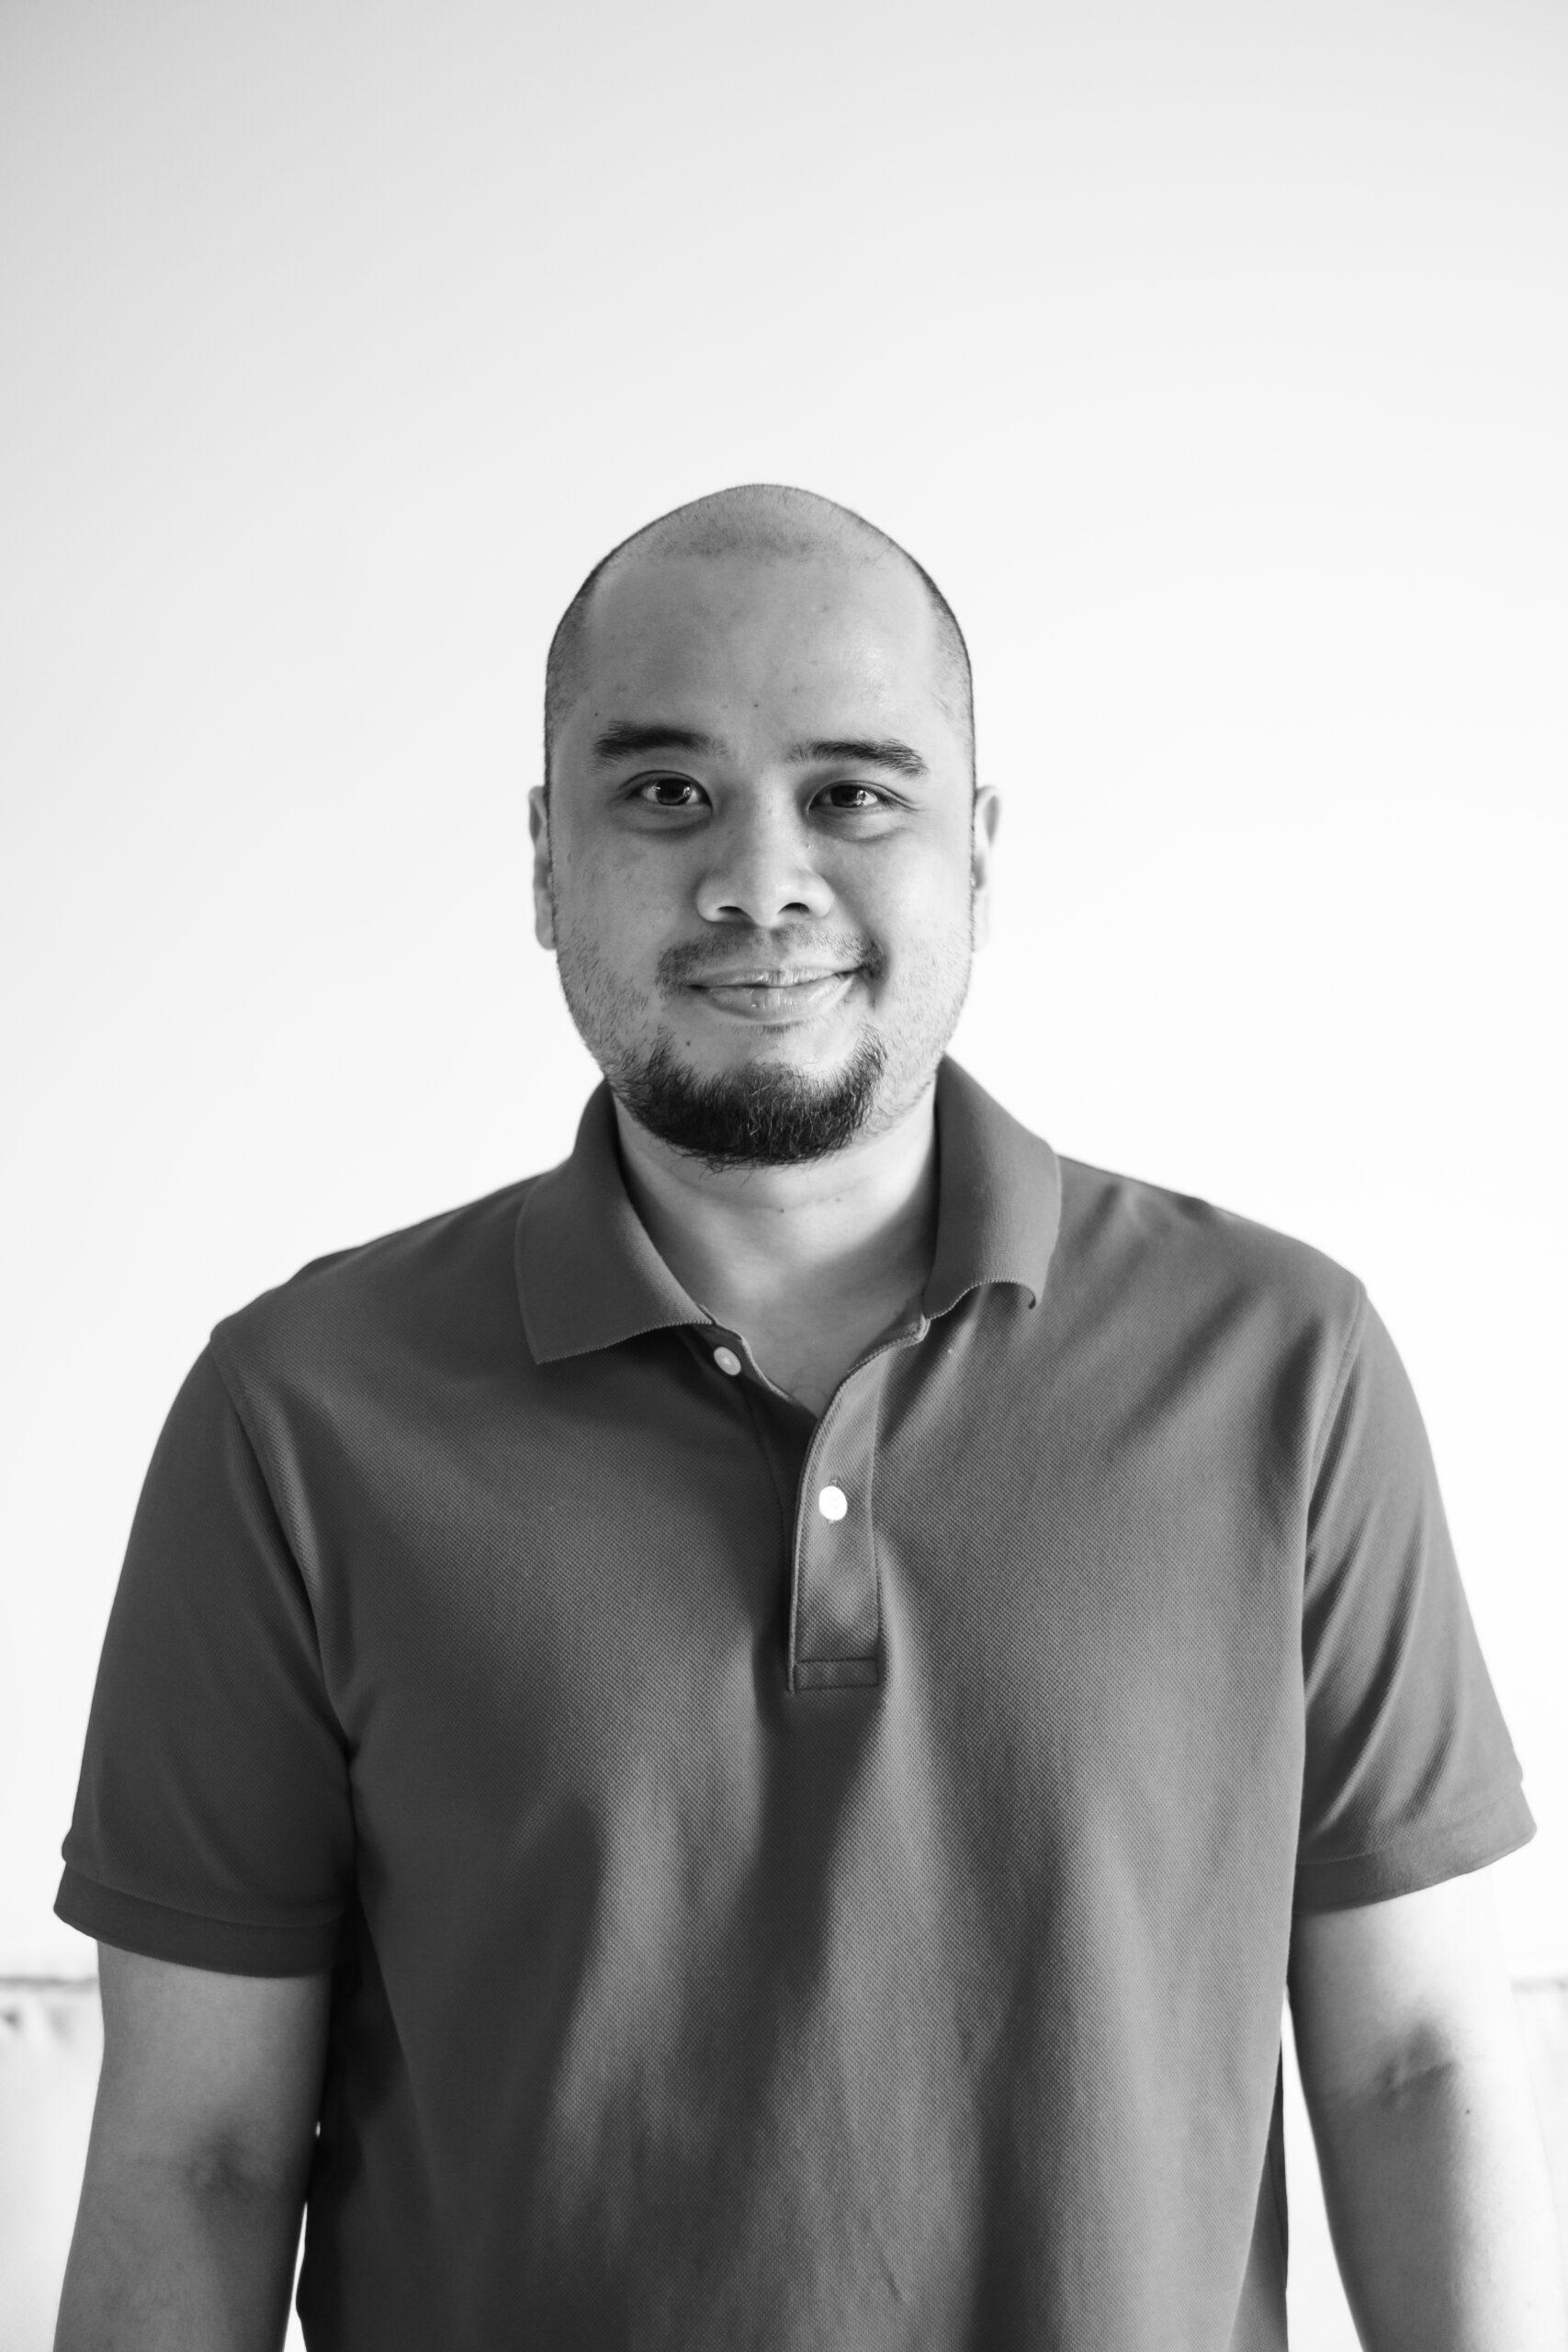 Photo of Carlo Reyes-Coloma